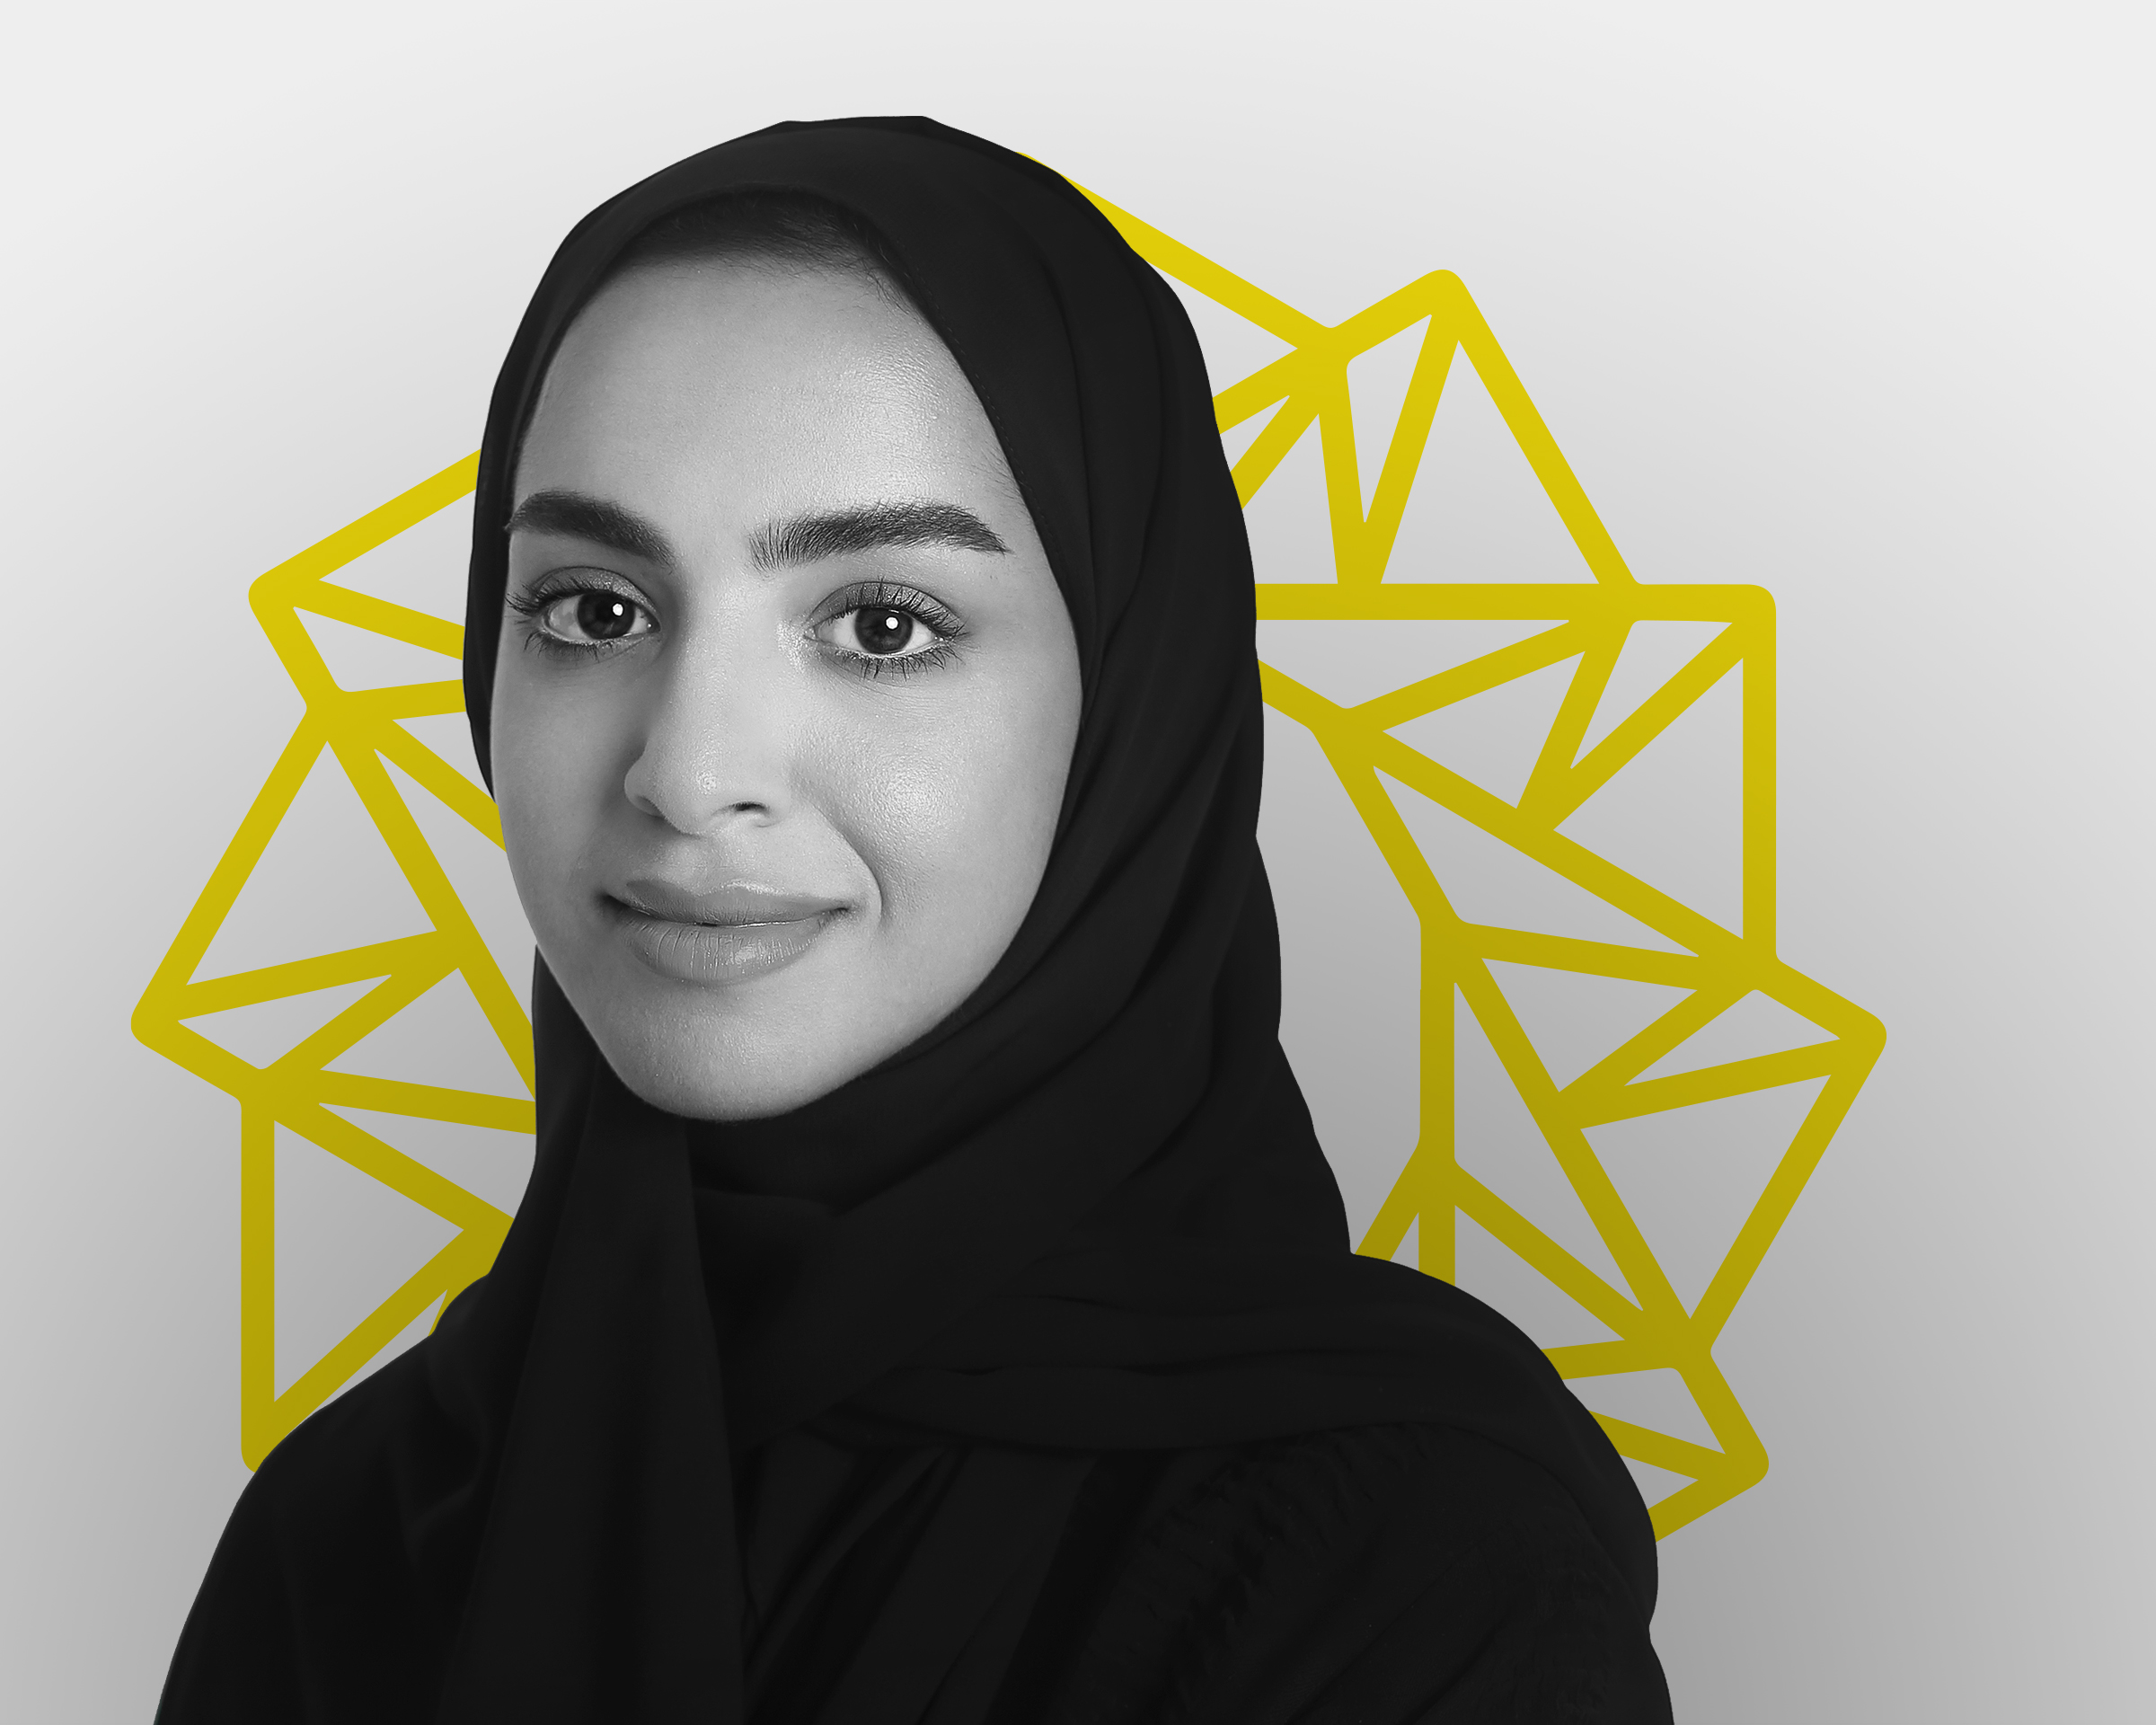 Dana A. Al-Mannai - 26 years oldEntrepreneur, Athlete and Adventurer